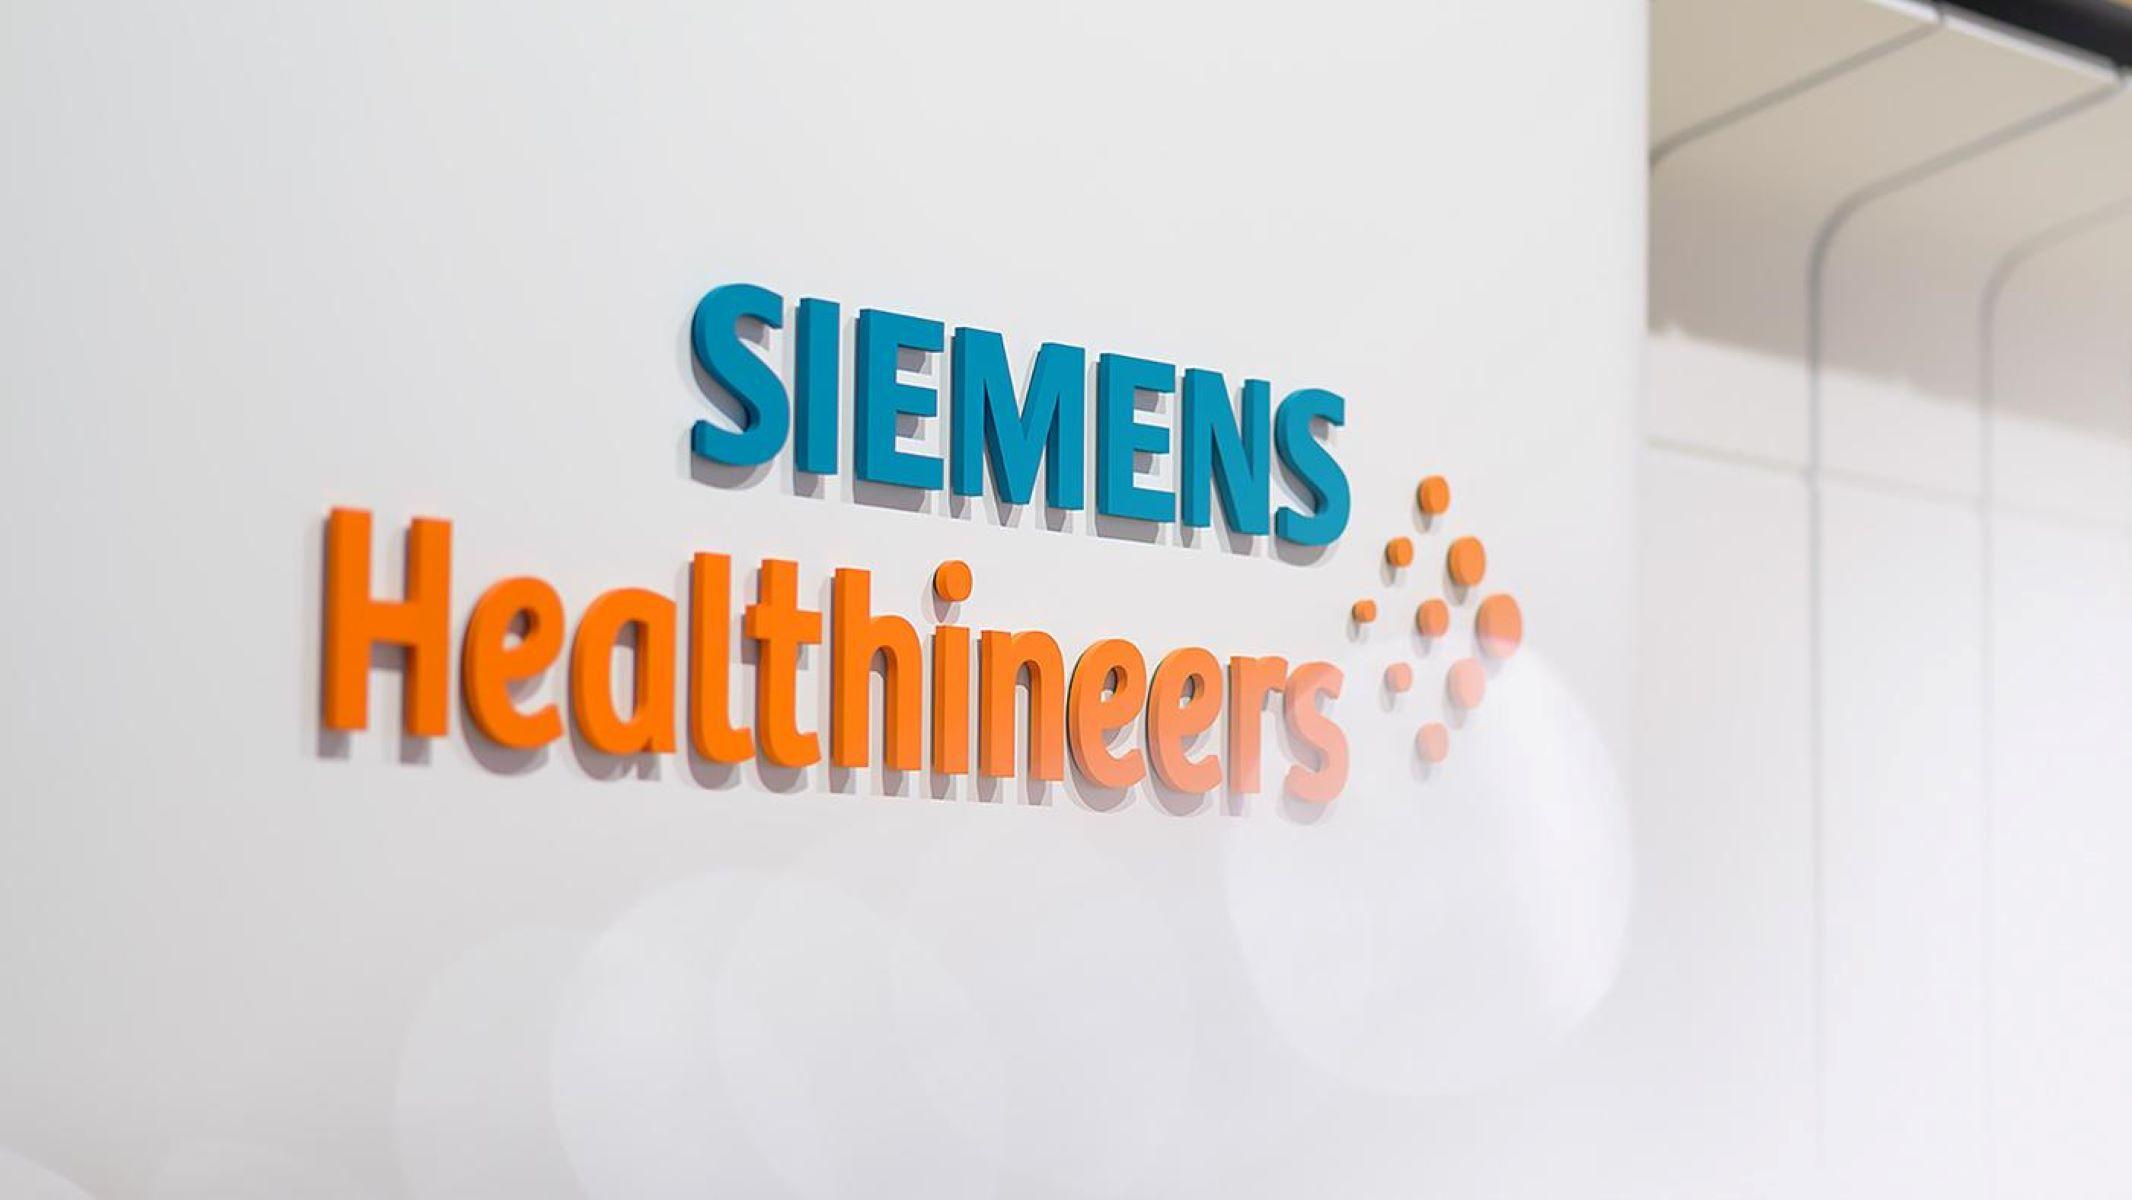 Siemens Healthineers : απέκτησε την Πιστοποίηση του Great Place to Work®